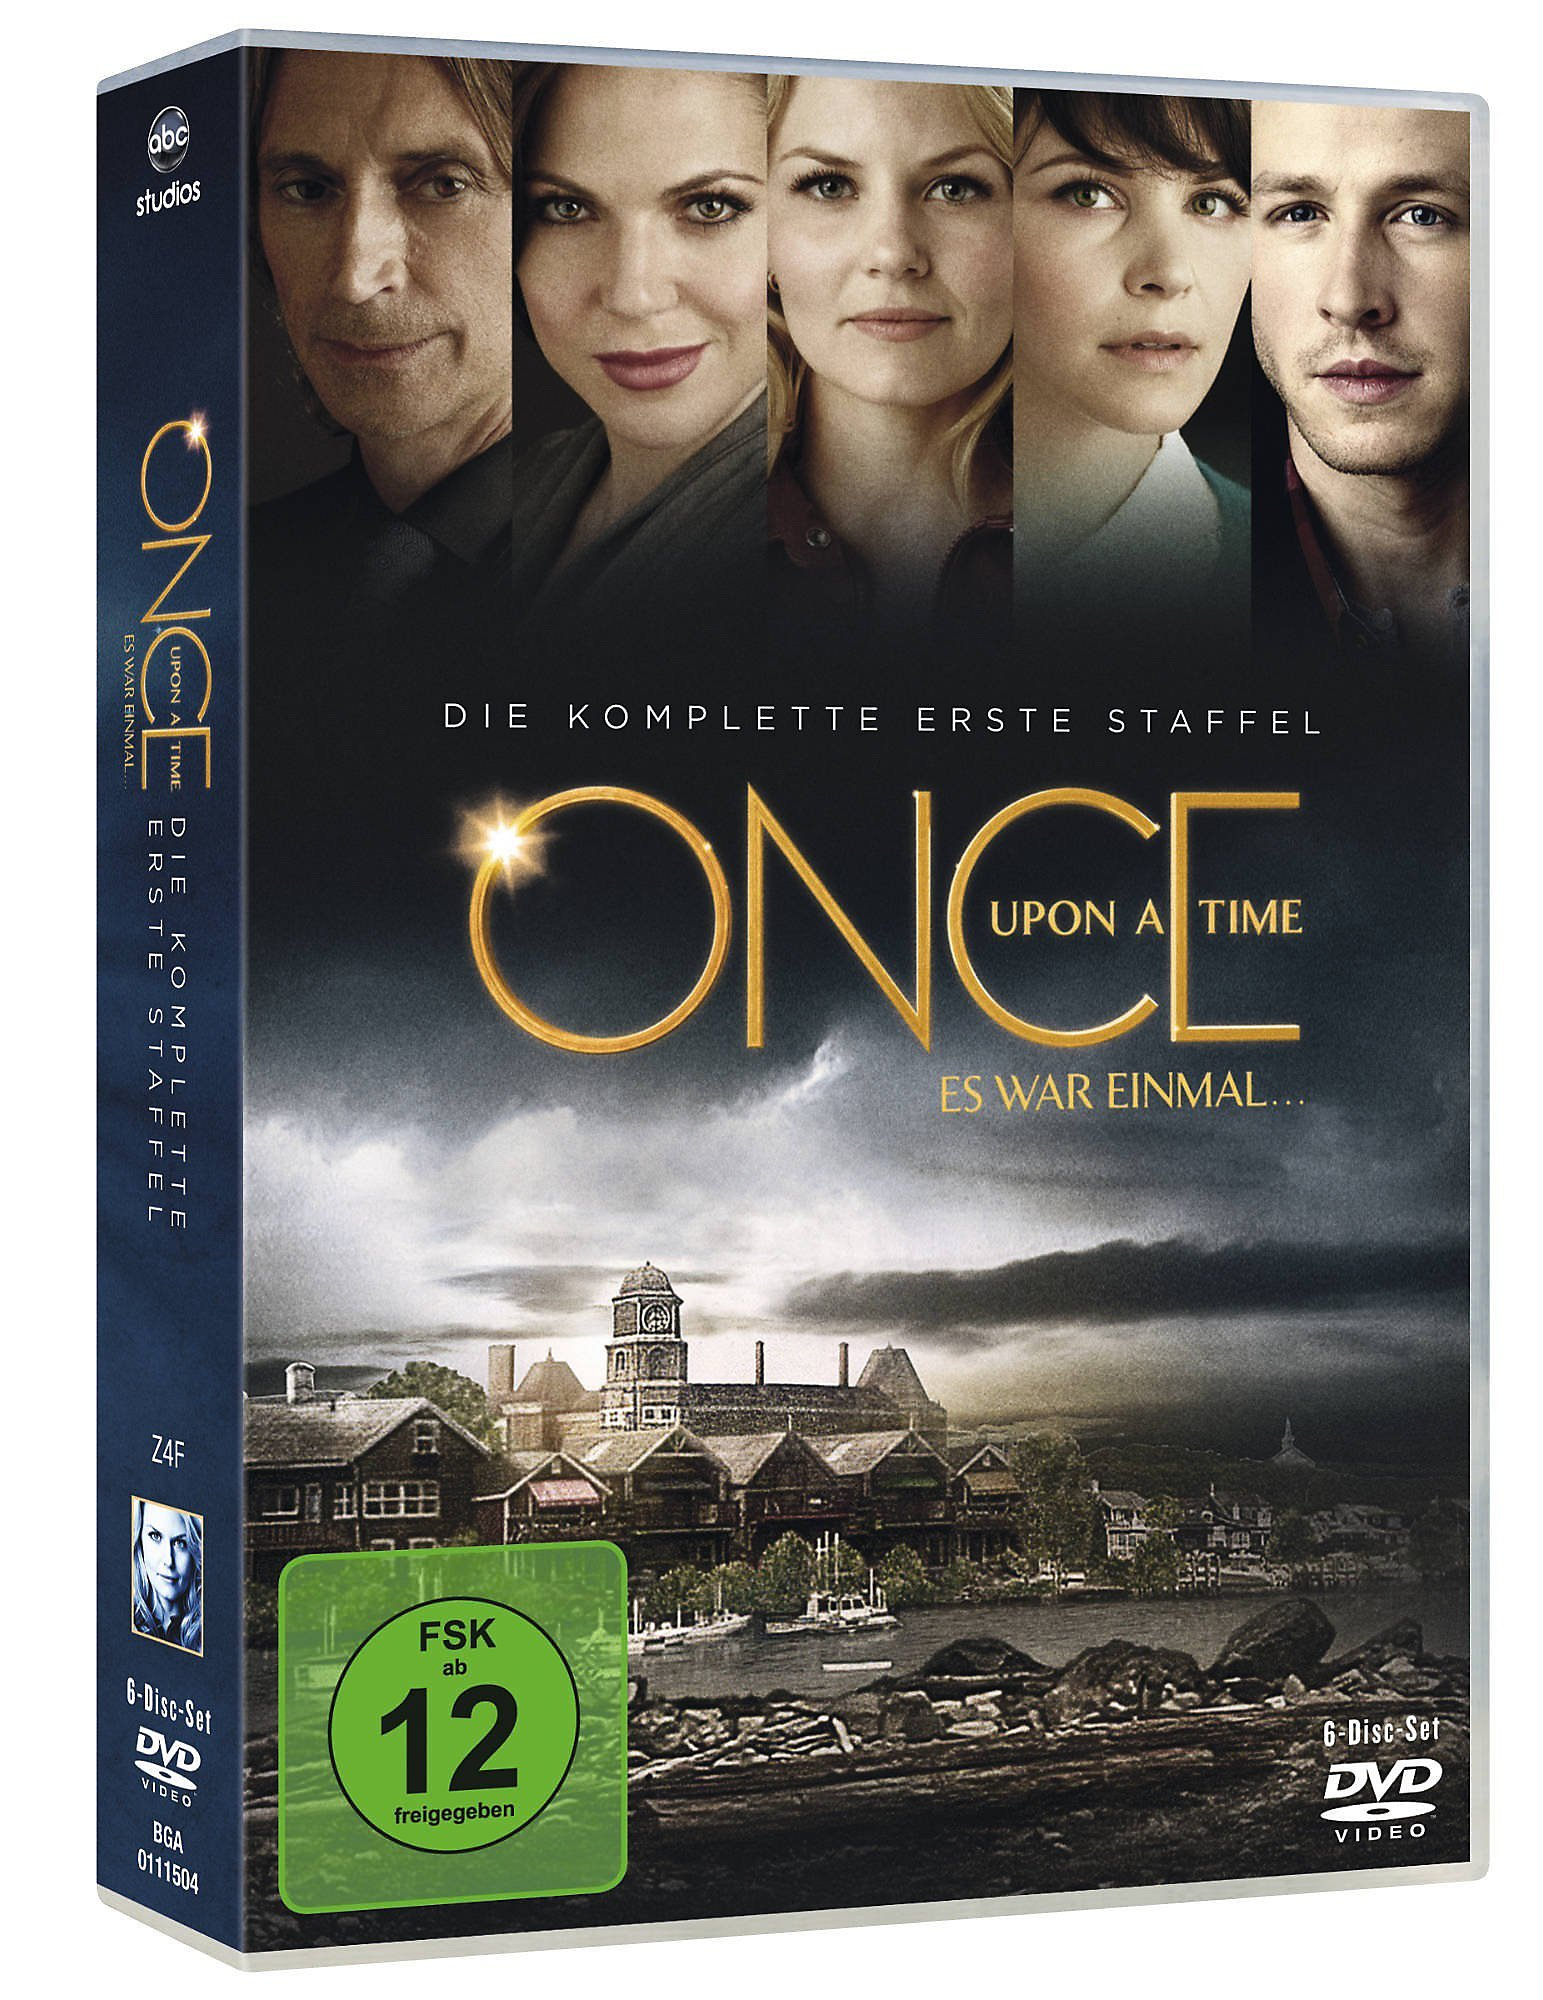 Once Upon A Time Es War Einmal Staffel 1 Dvd Weltbildch